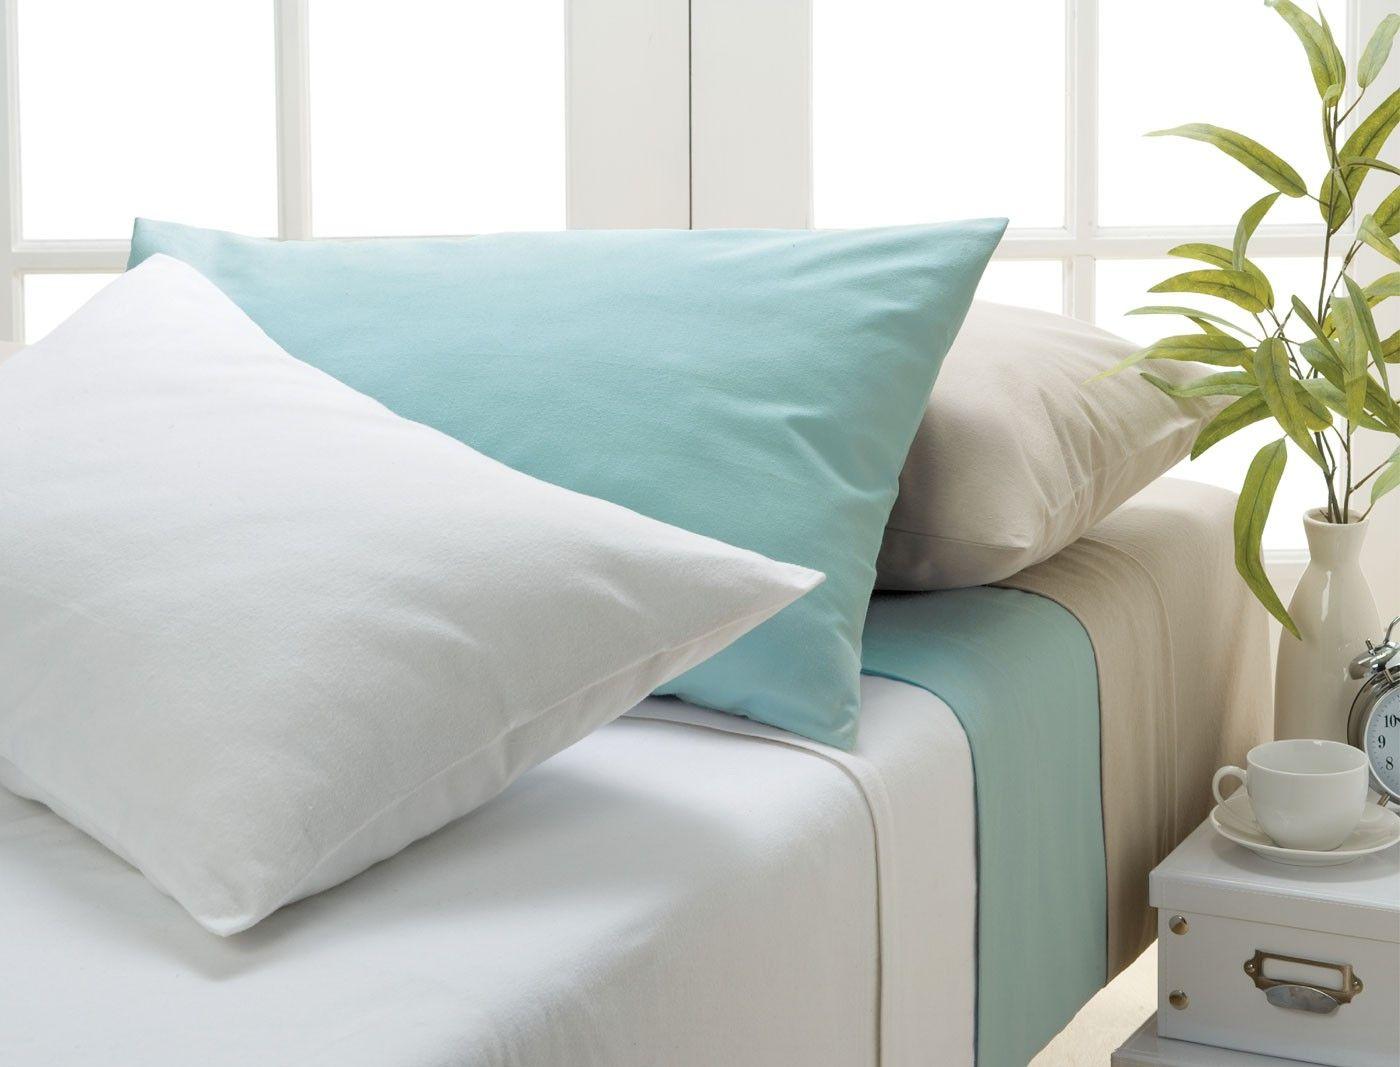 Flannelette Sheet Set | Bed Bath N\' Table | Hgtv home | Pinterest ...